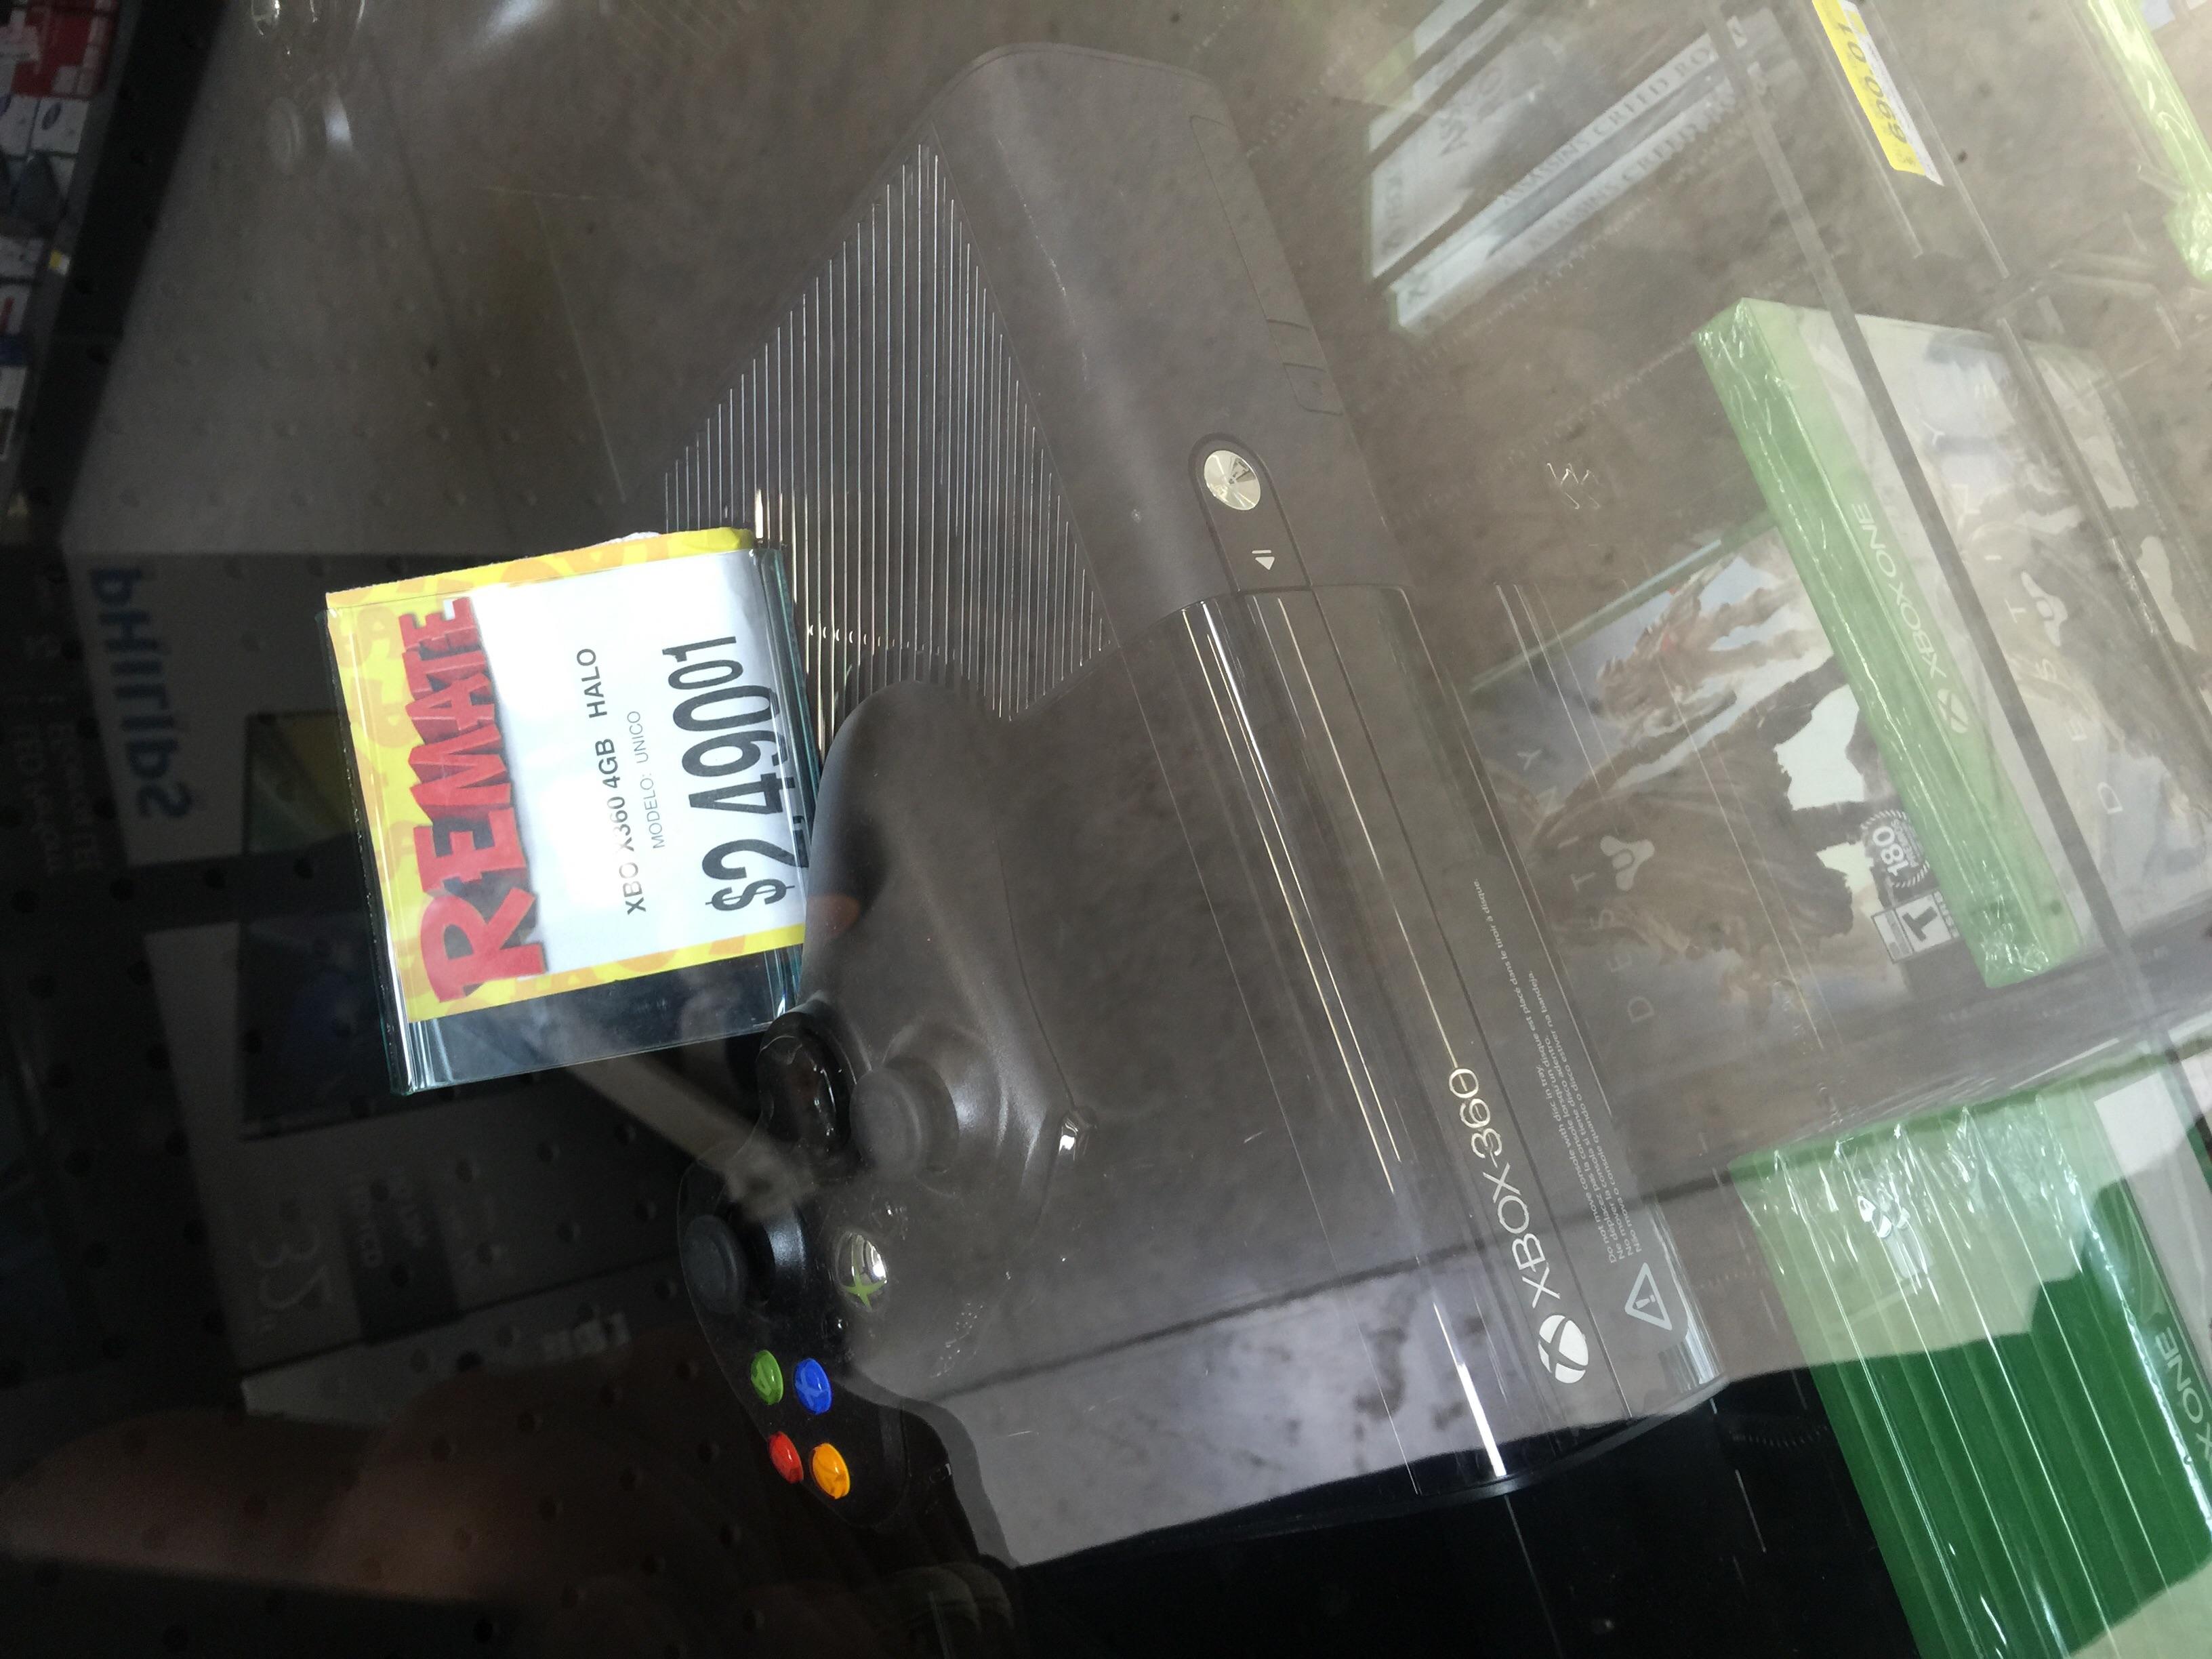 Bodega Aurrera: XBOX 360 4GB HALO $2,490.01